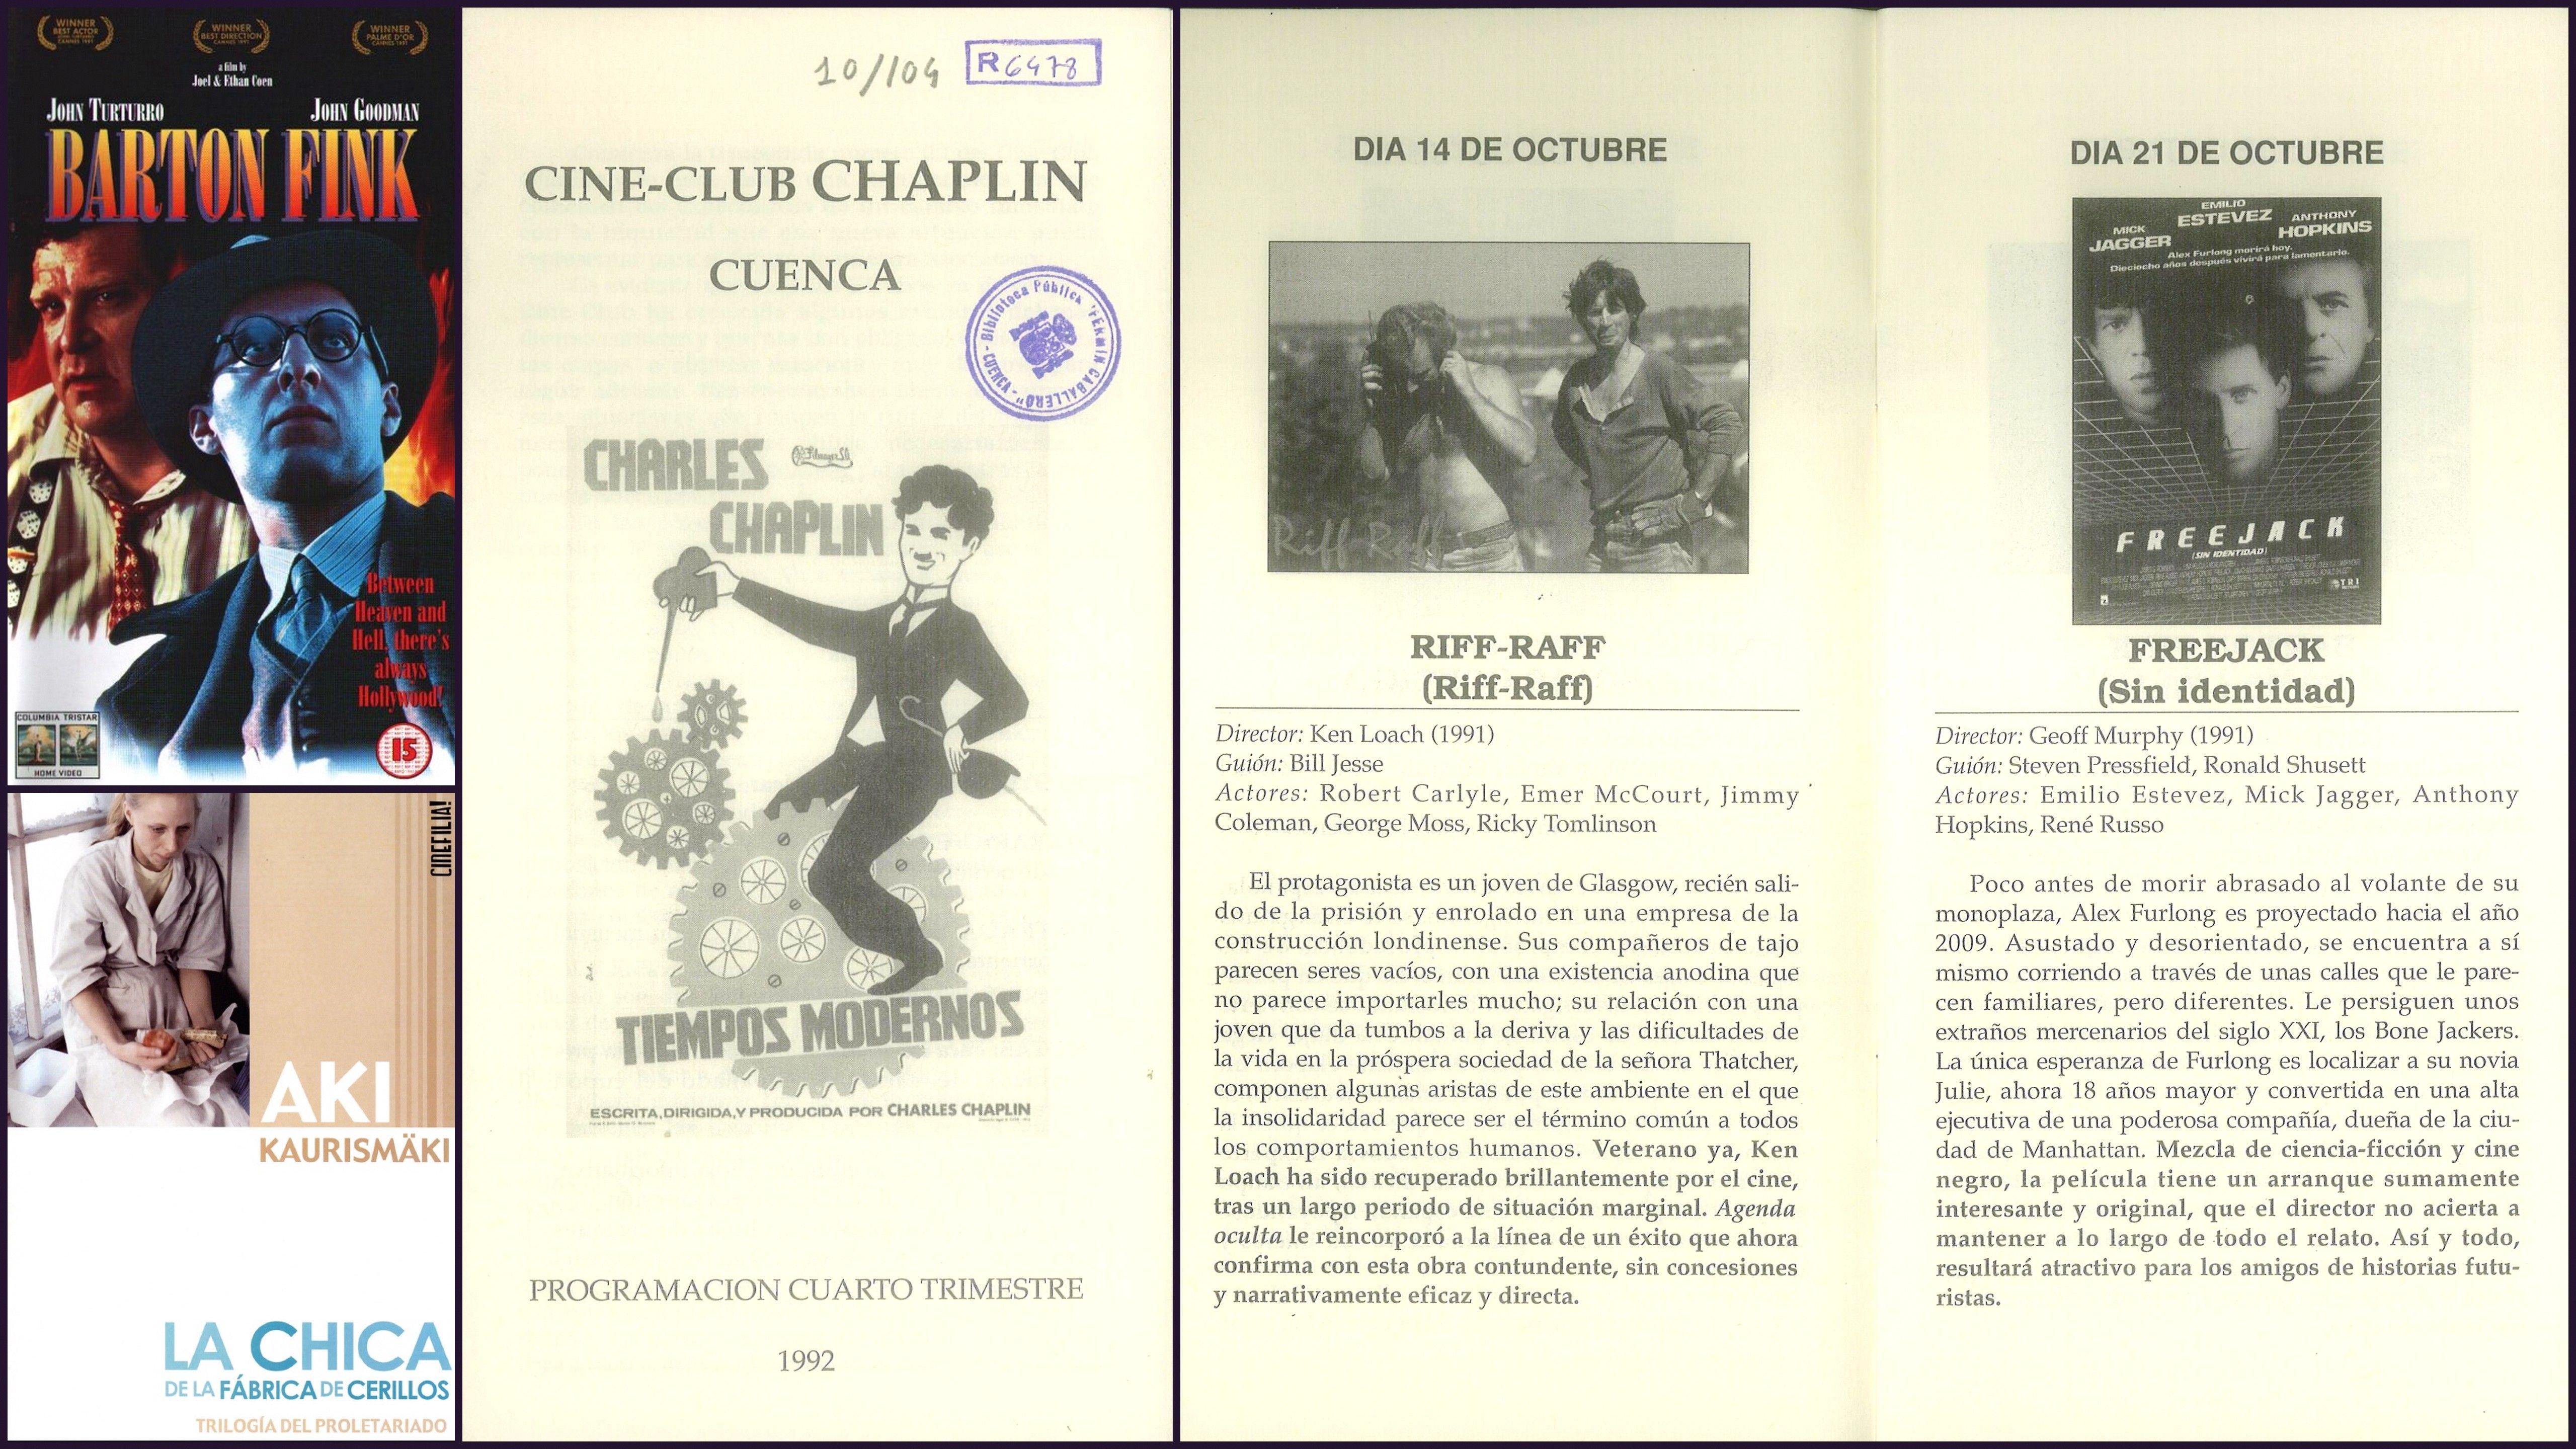 Programación Cine-Club \